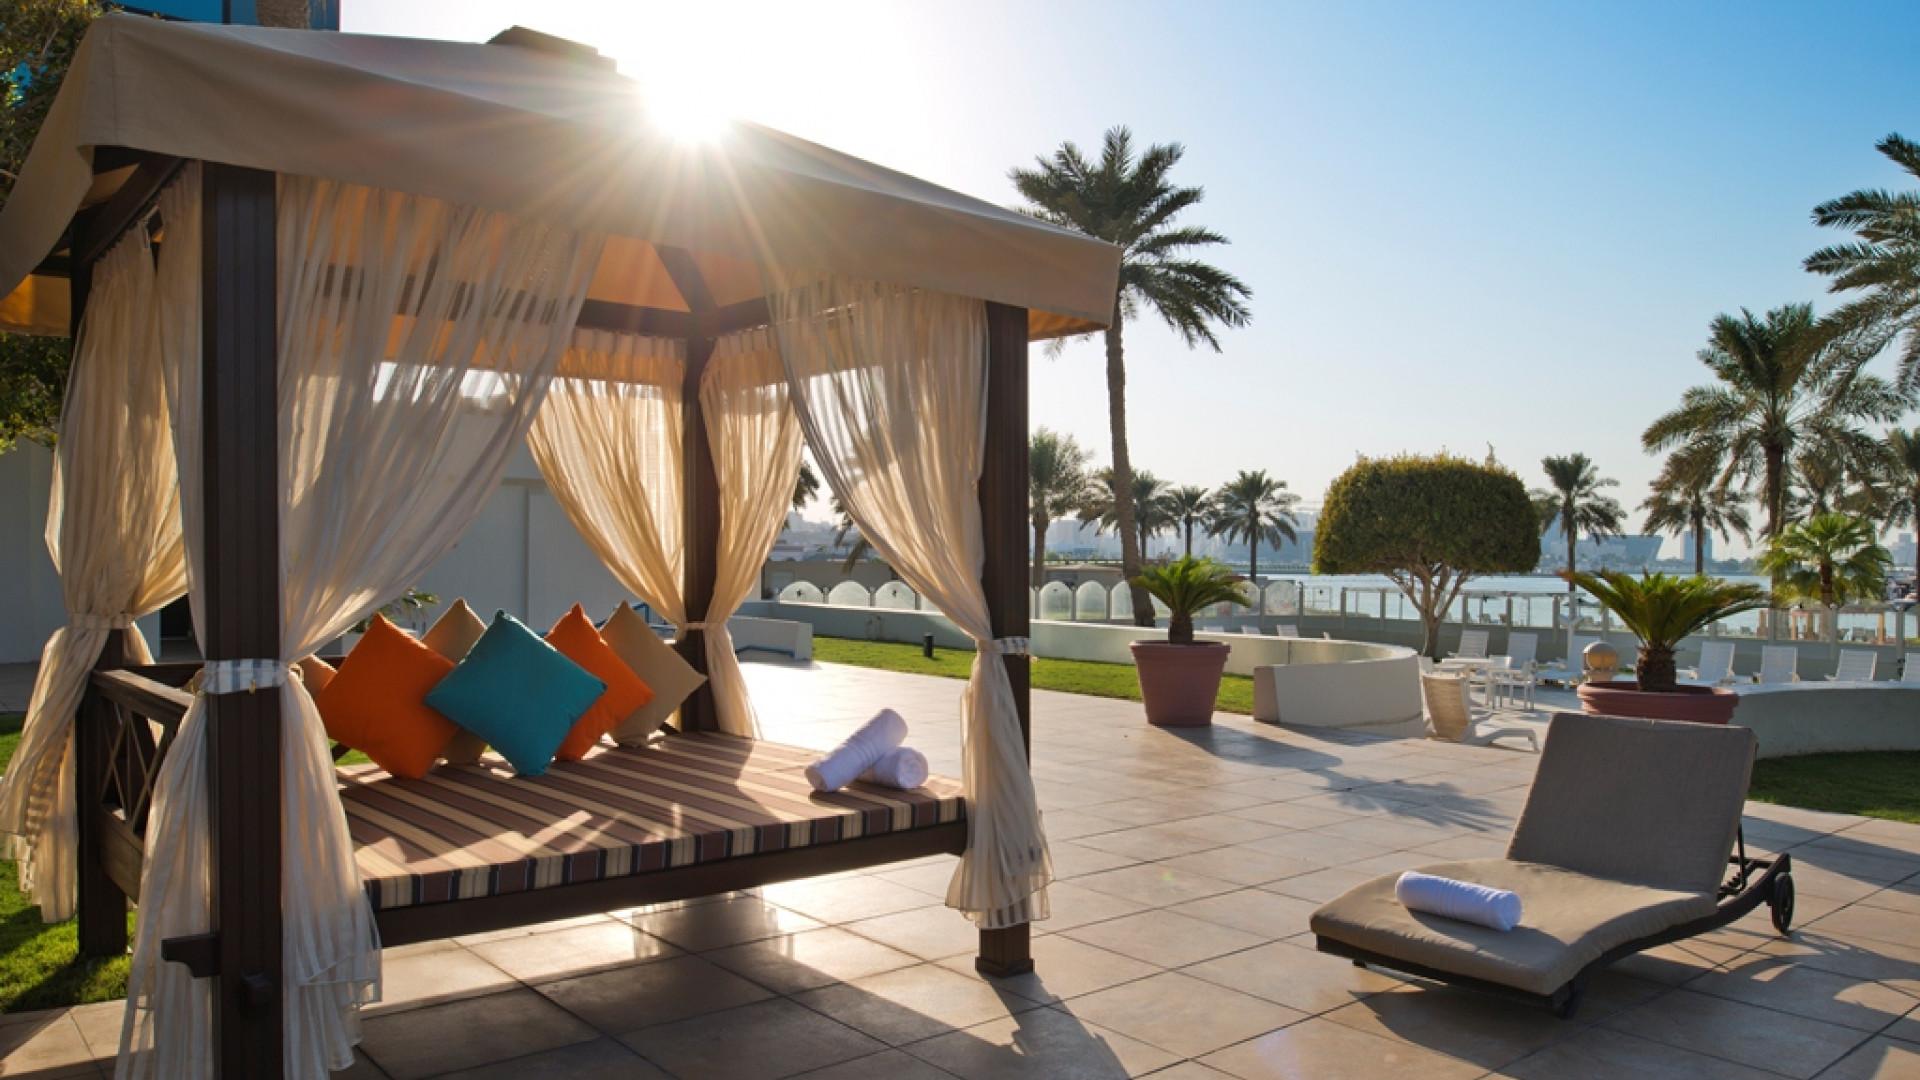 Cabanas at Doha Marriott hotel, Qatar